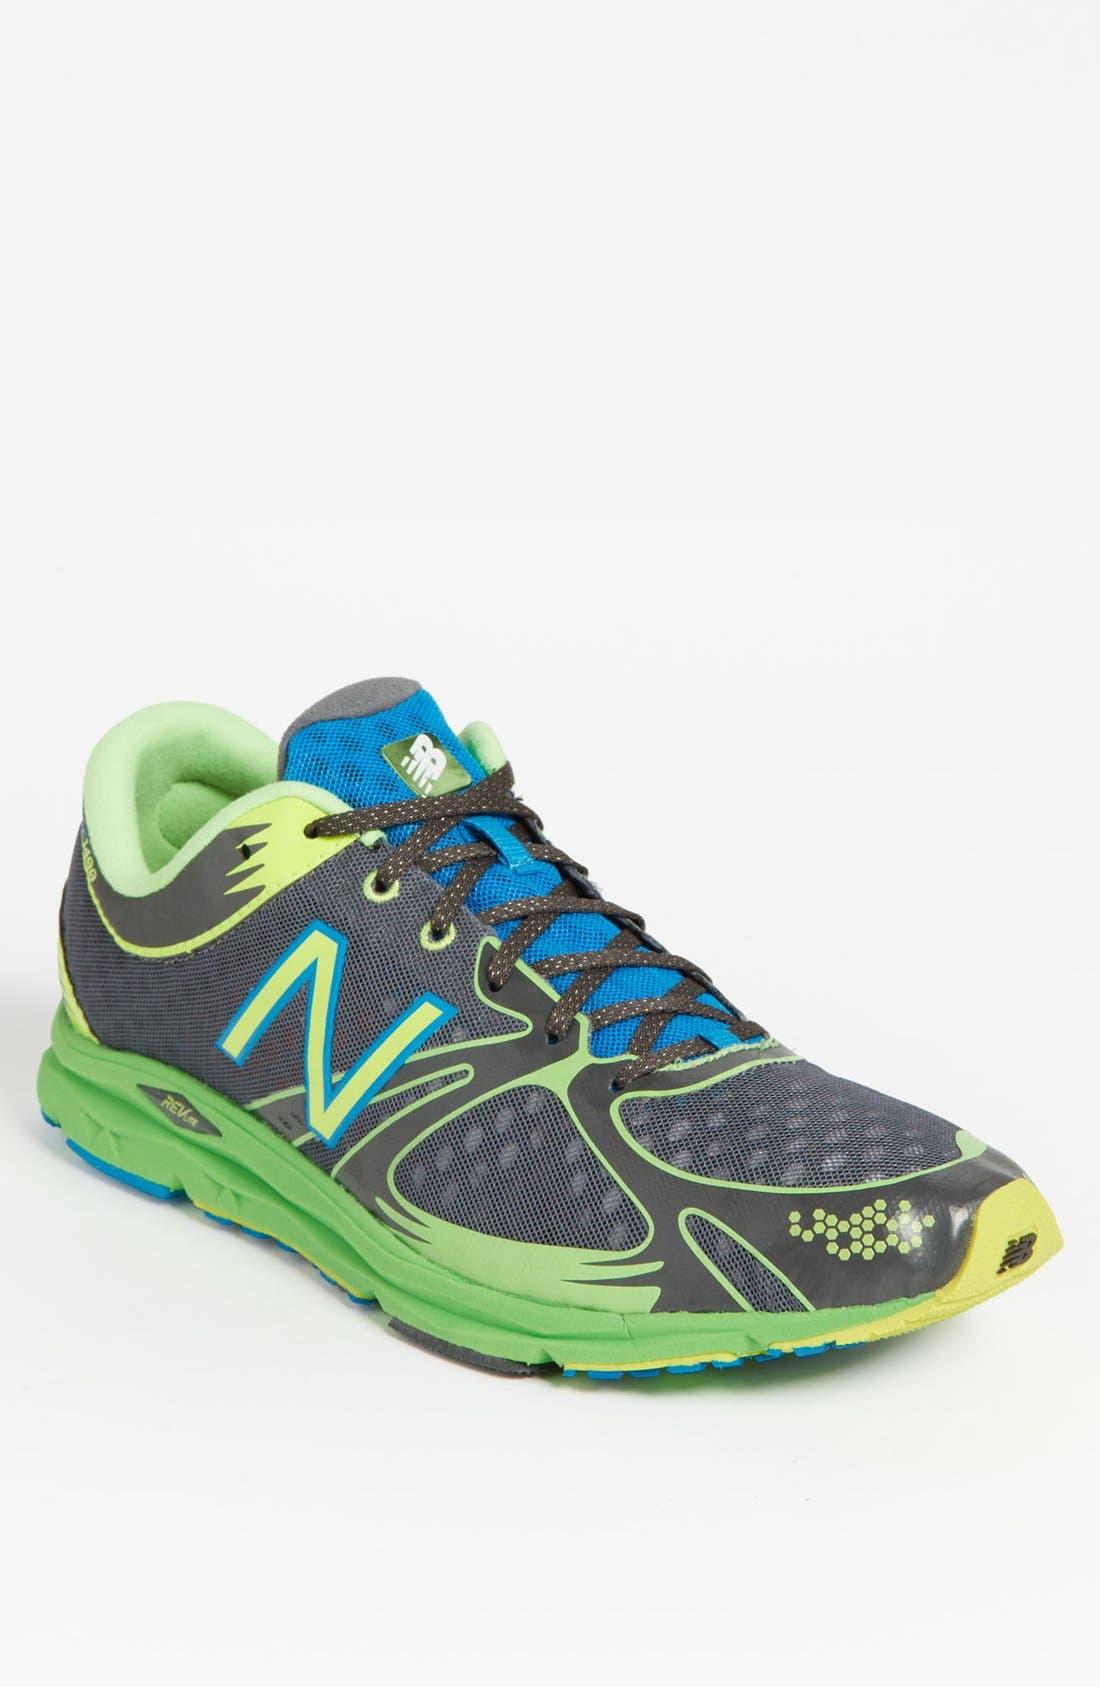 Main Image - New Balance '1400' Running Shoe (Men) (Online Only)